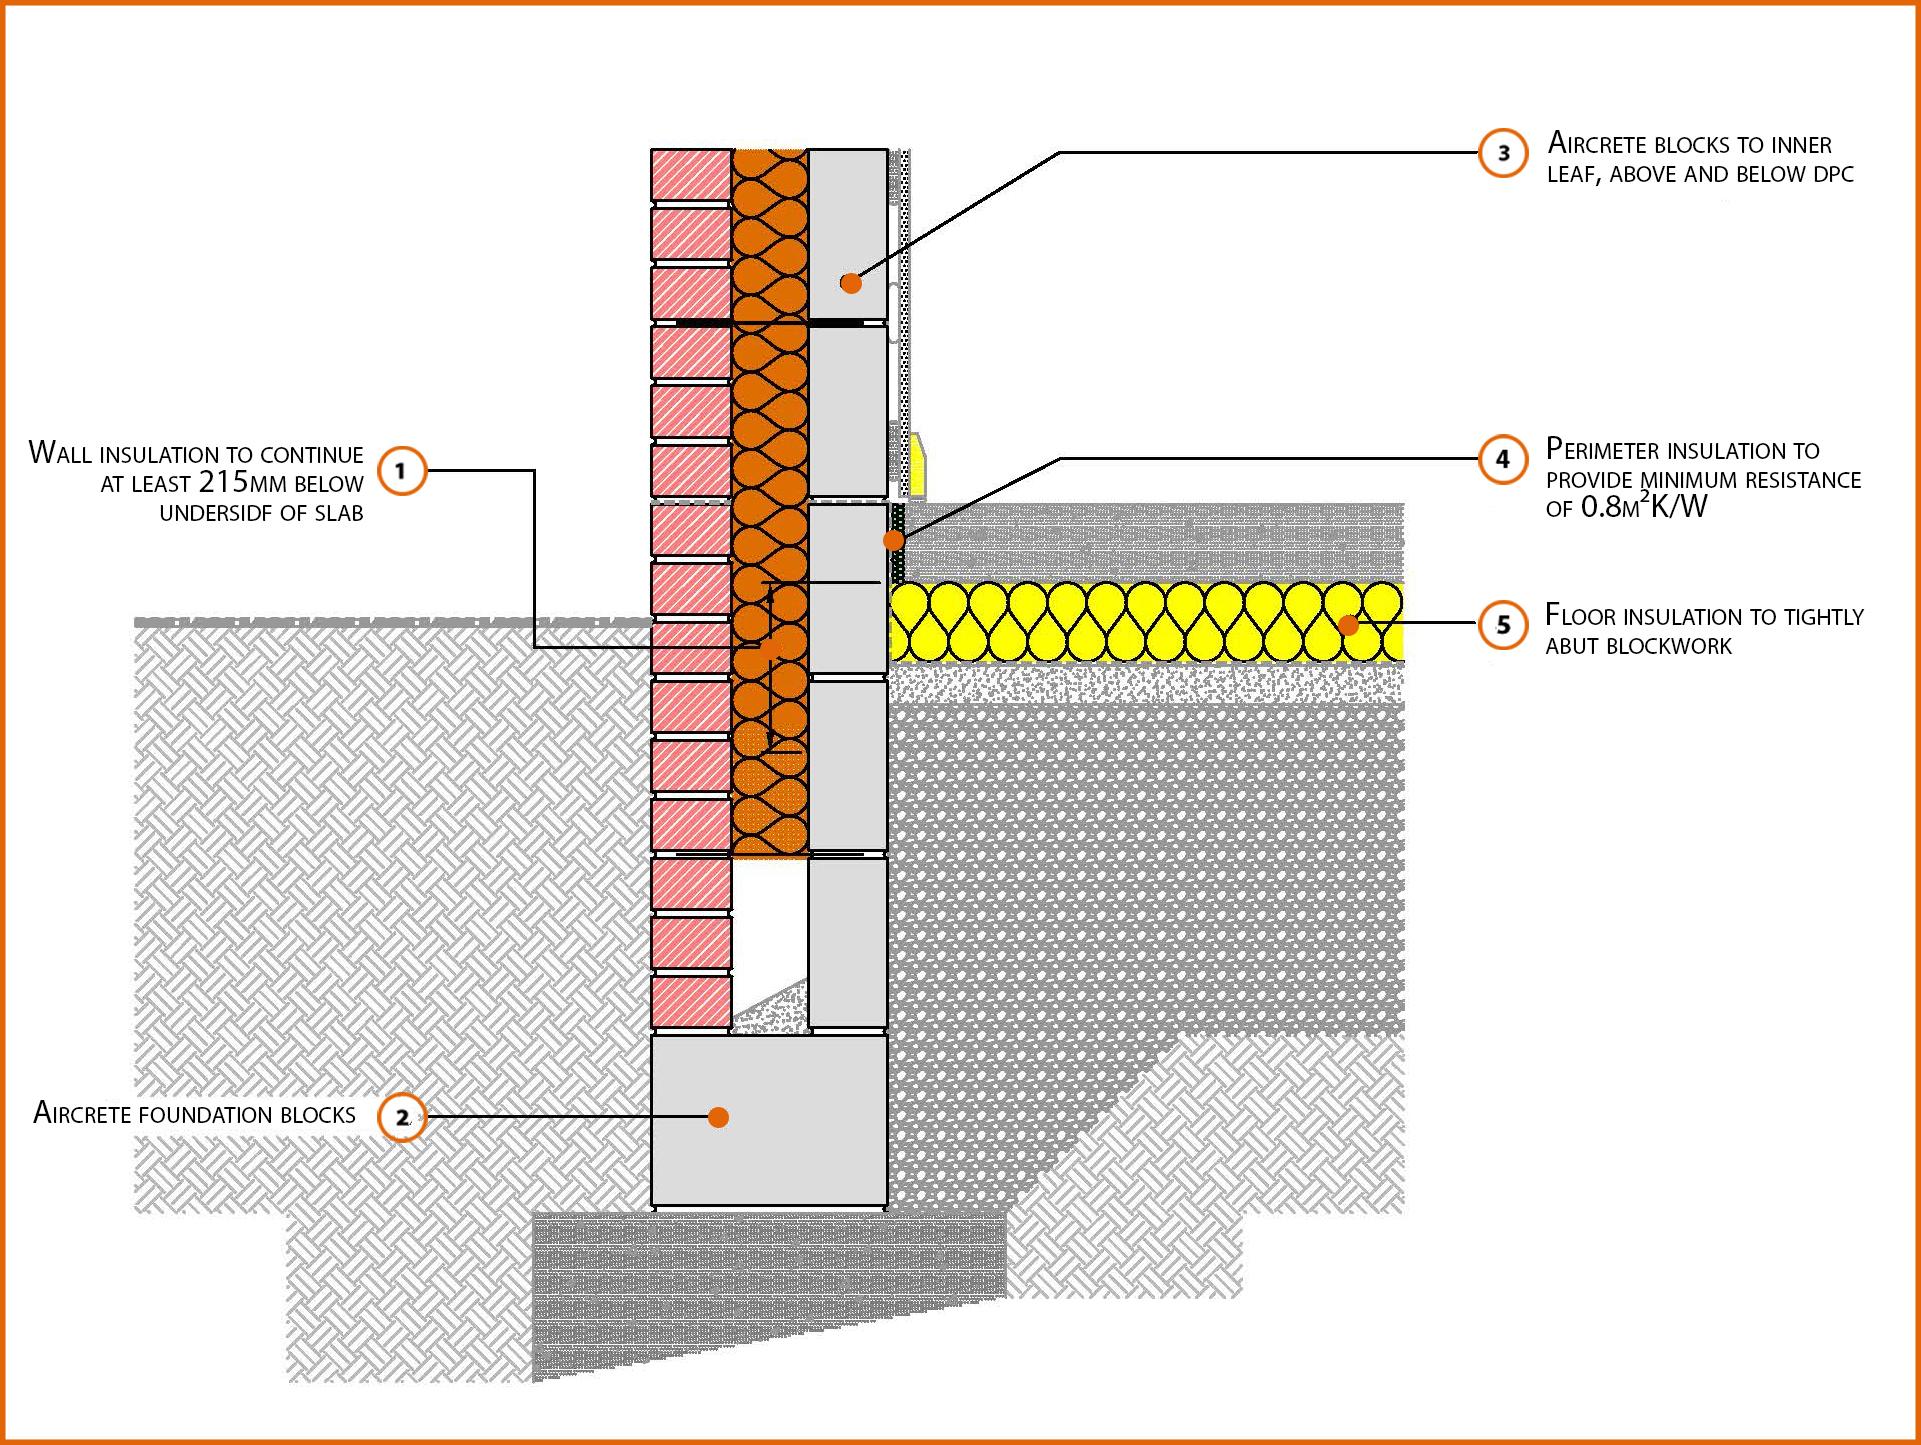 E5mcff26 Concrete Ground Bearing Floor Insulation Below